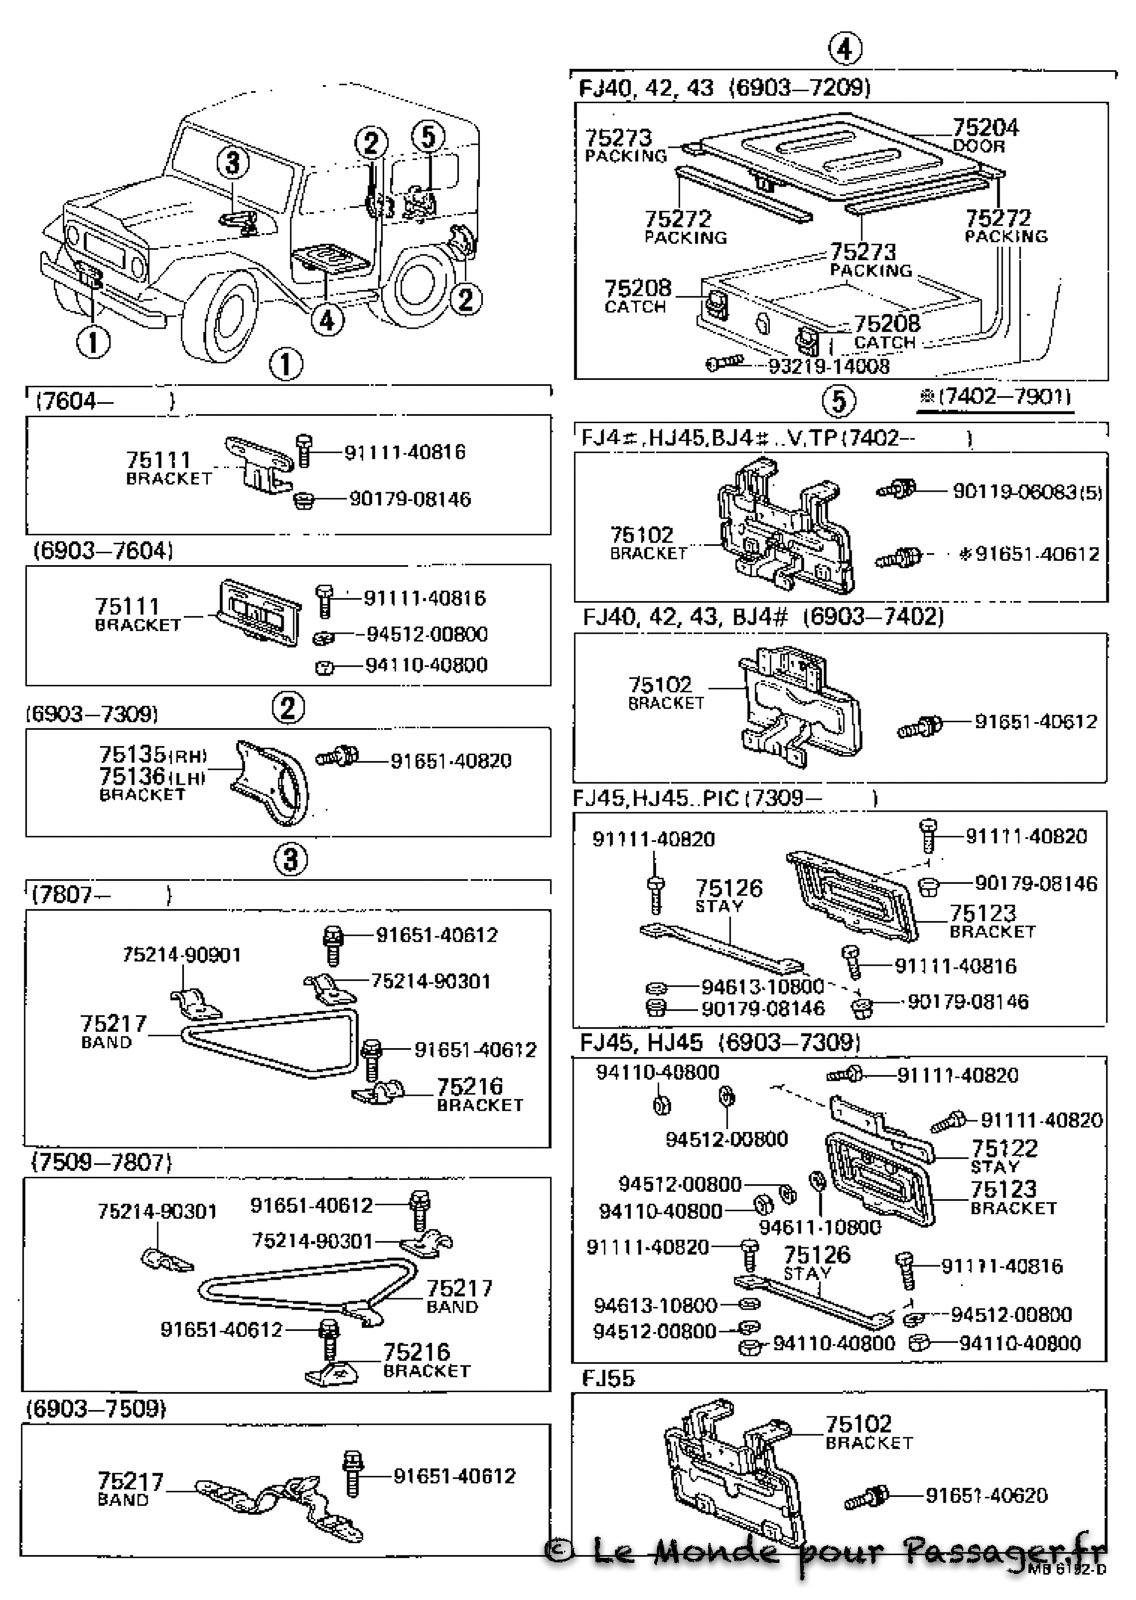 Fj55-Eclatés-Techniques108